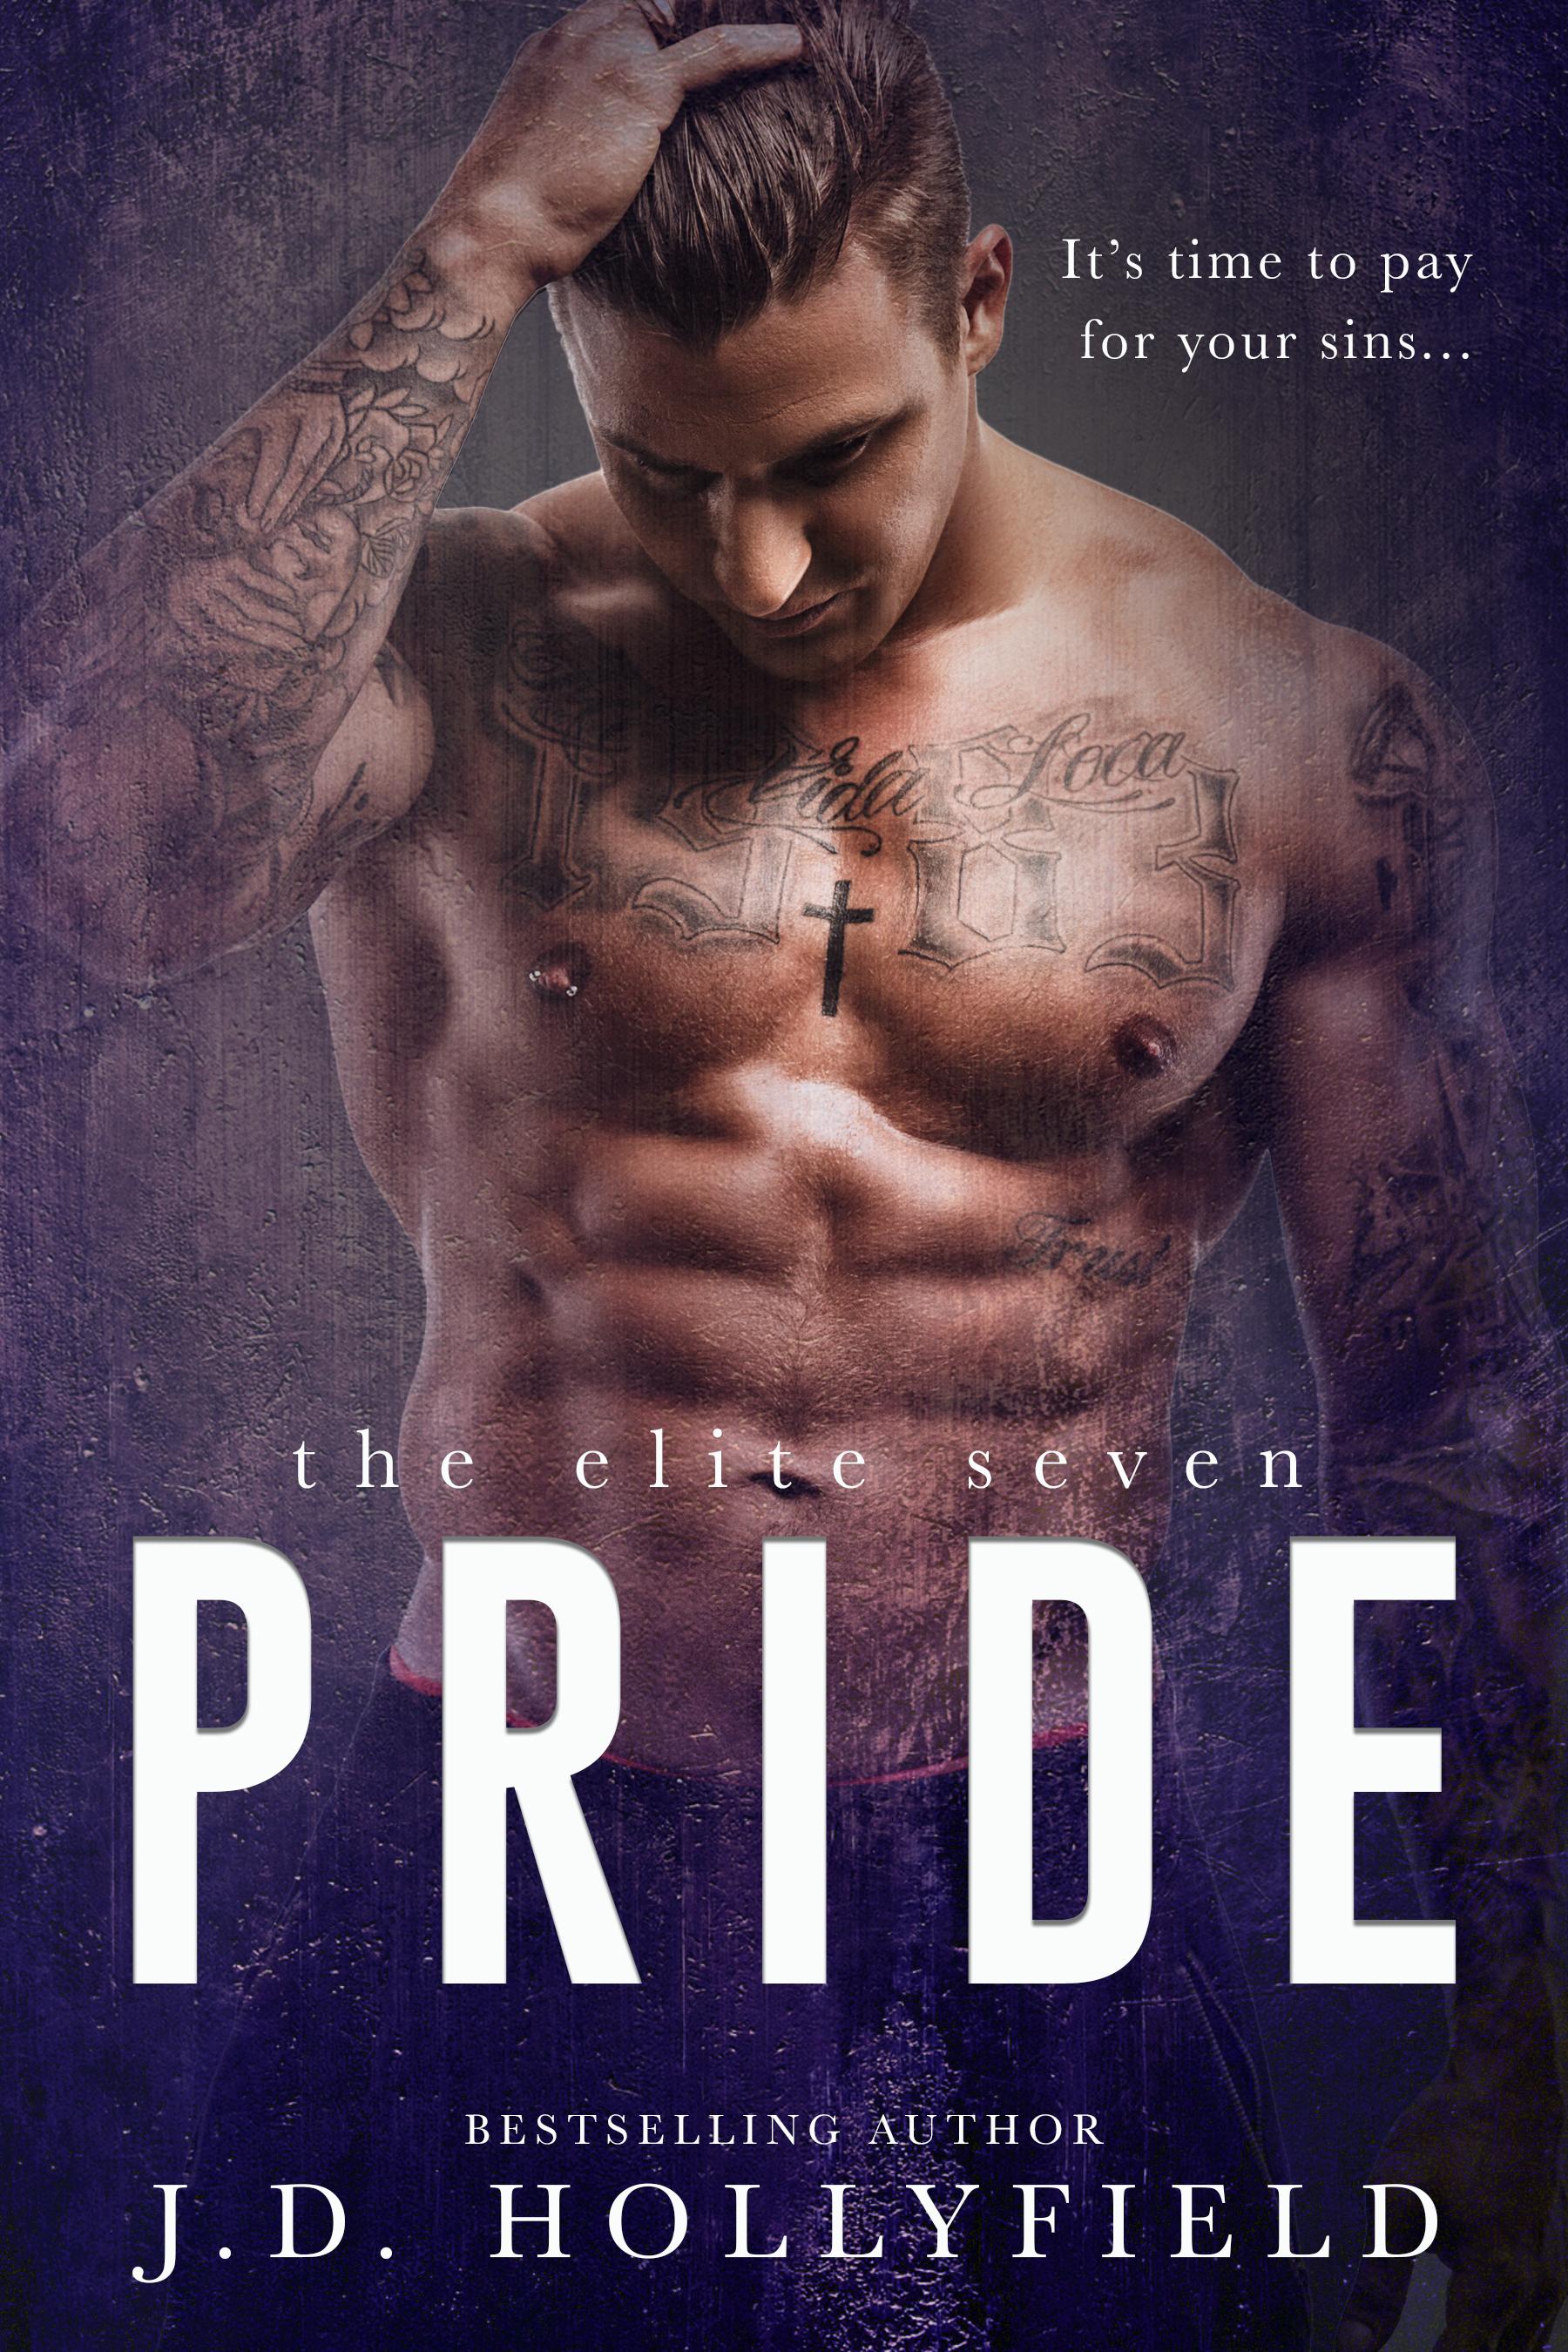 PrideJess.jpg